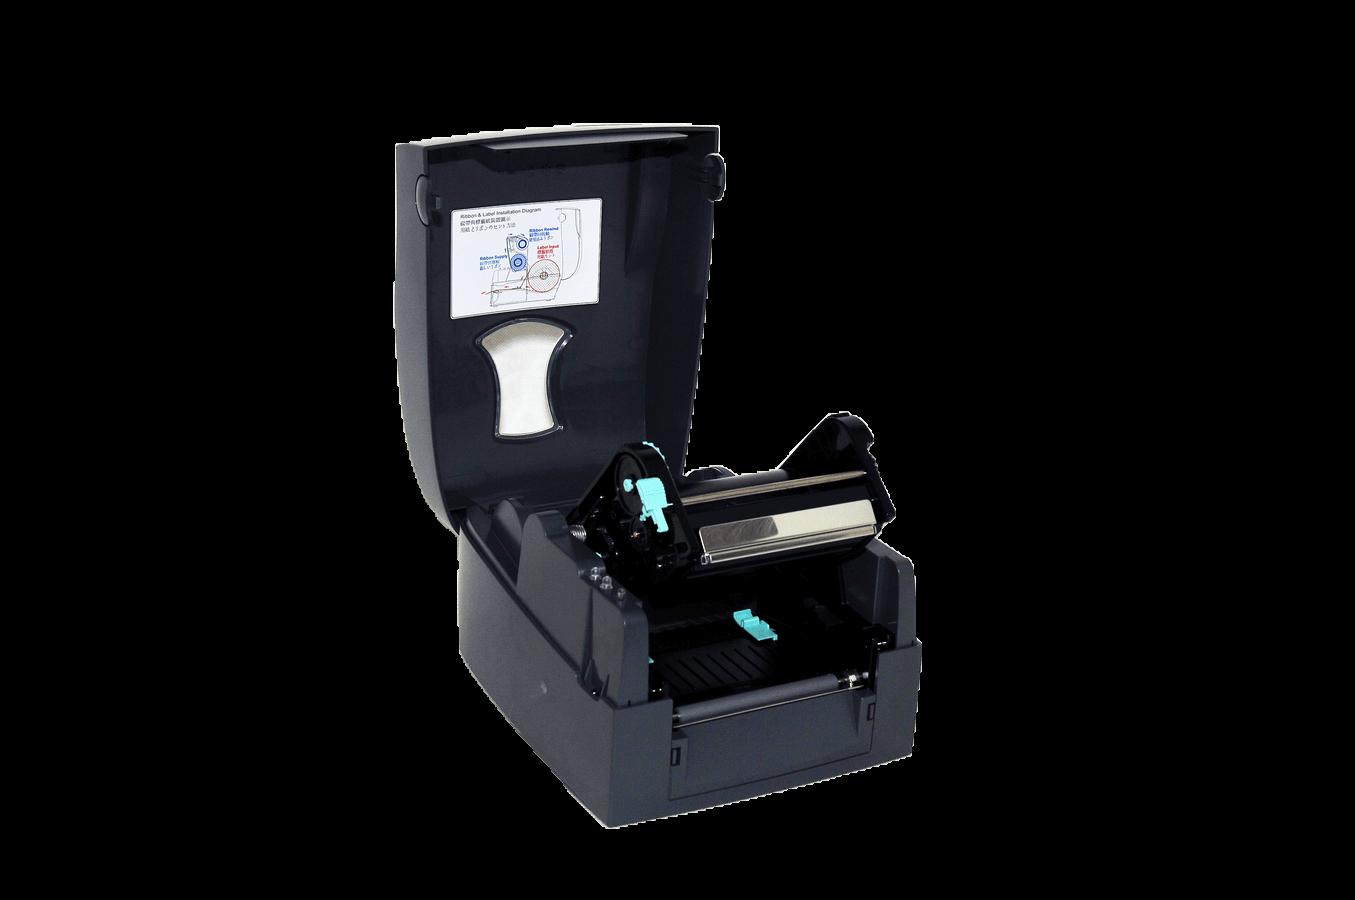 Otwarta drukarka Godex G500